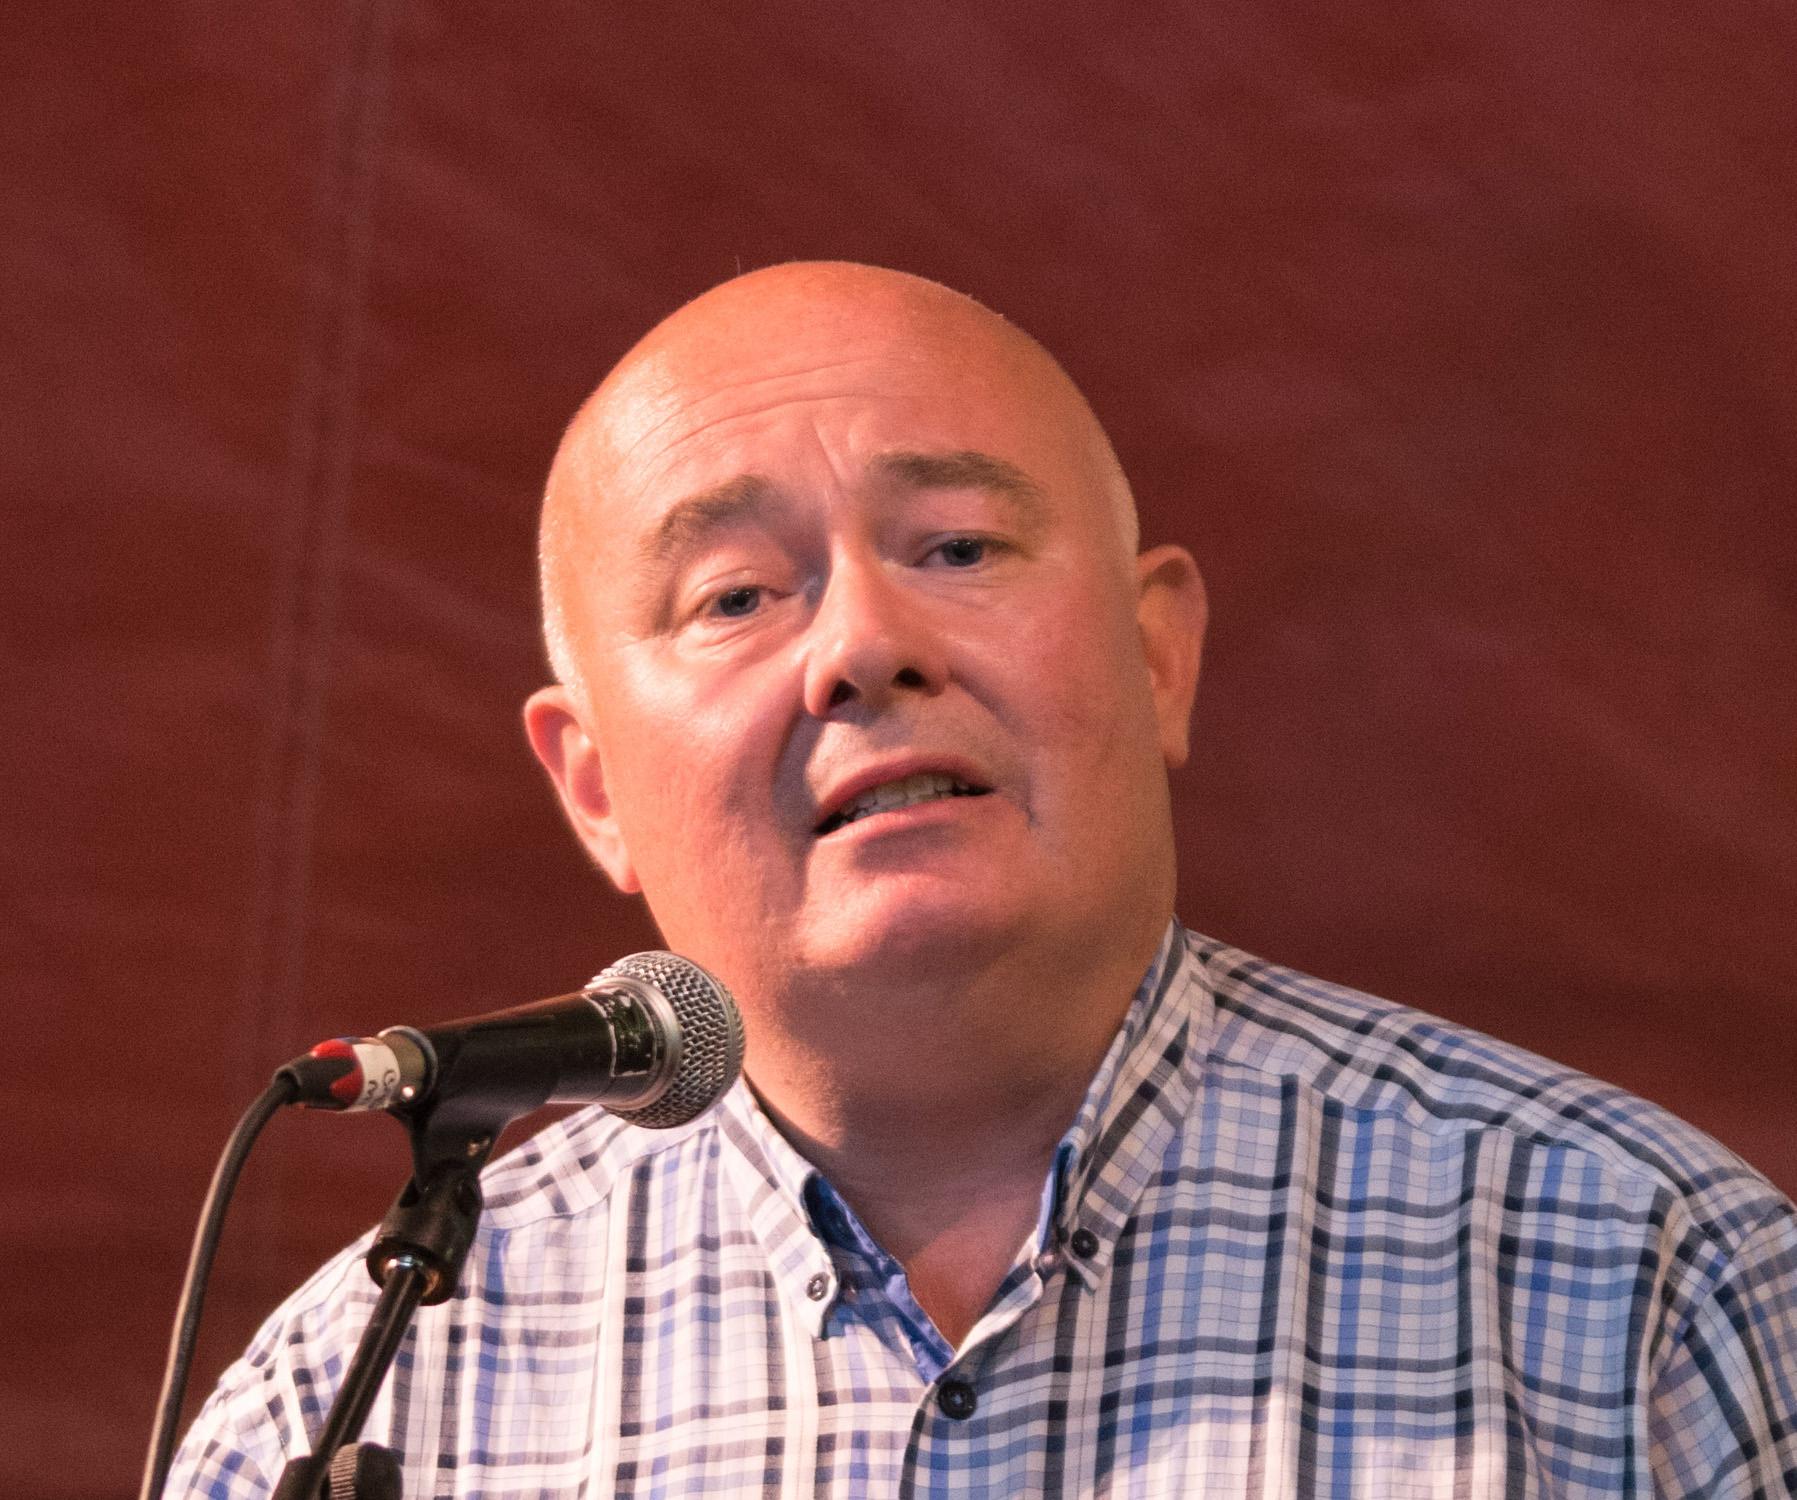 Iain MacPherson